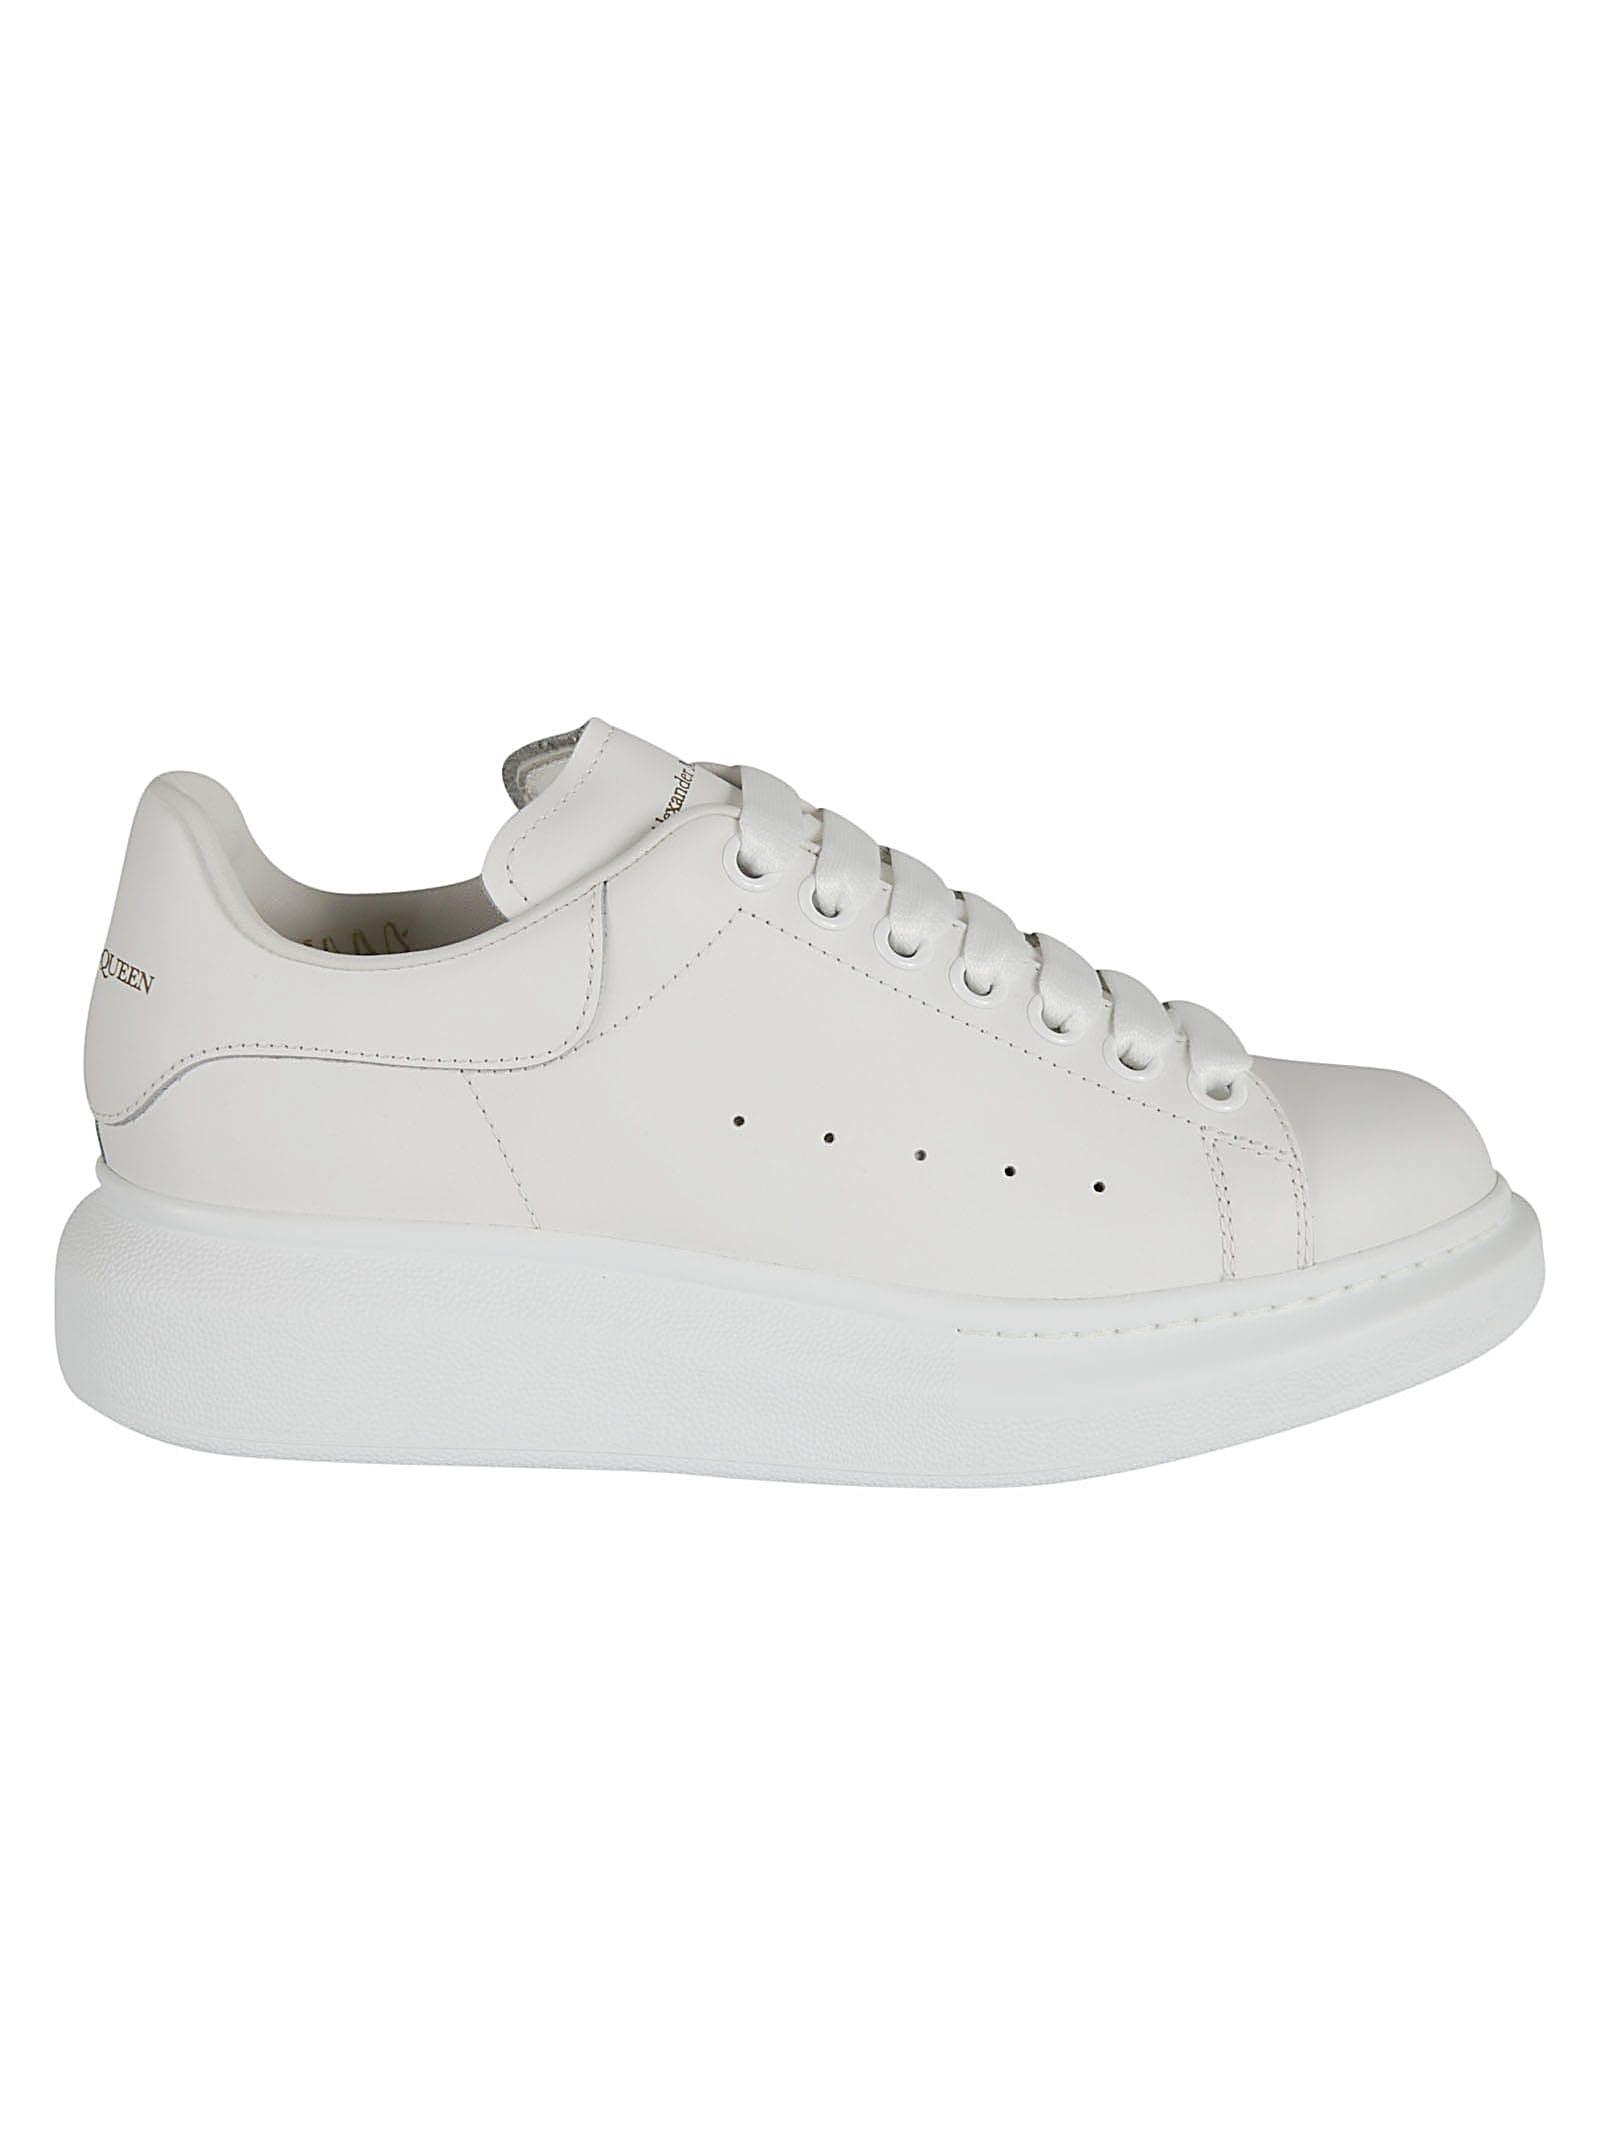 Alexander McQueen Perforated Logo Sneakers